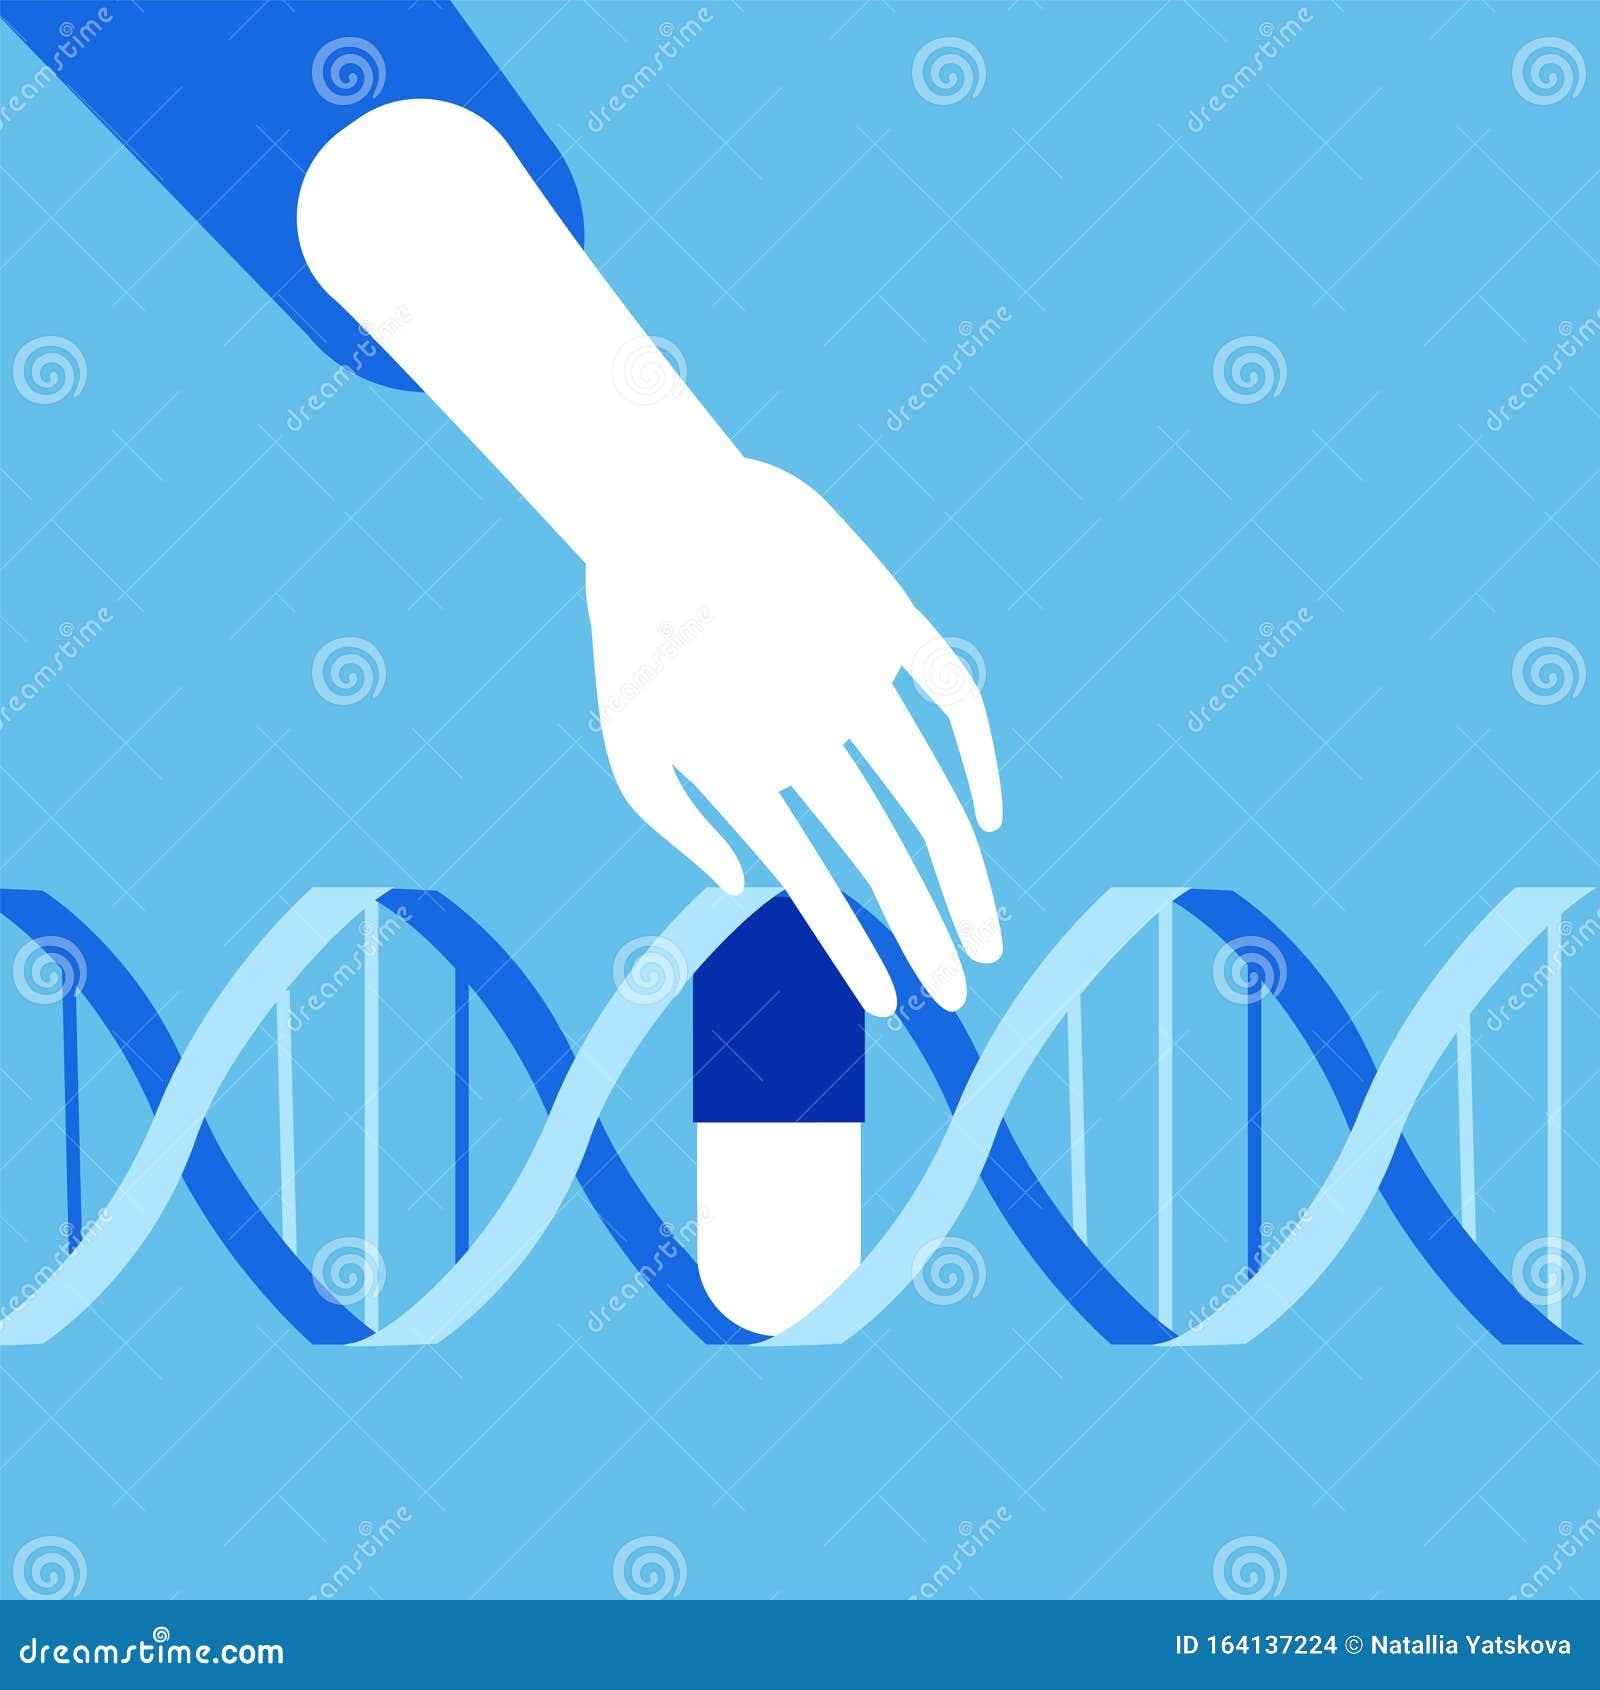 Cancer genetic engineering Human papillomavirus and neoplasia